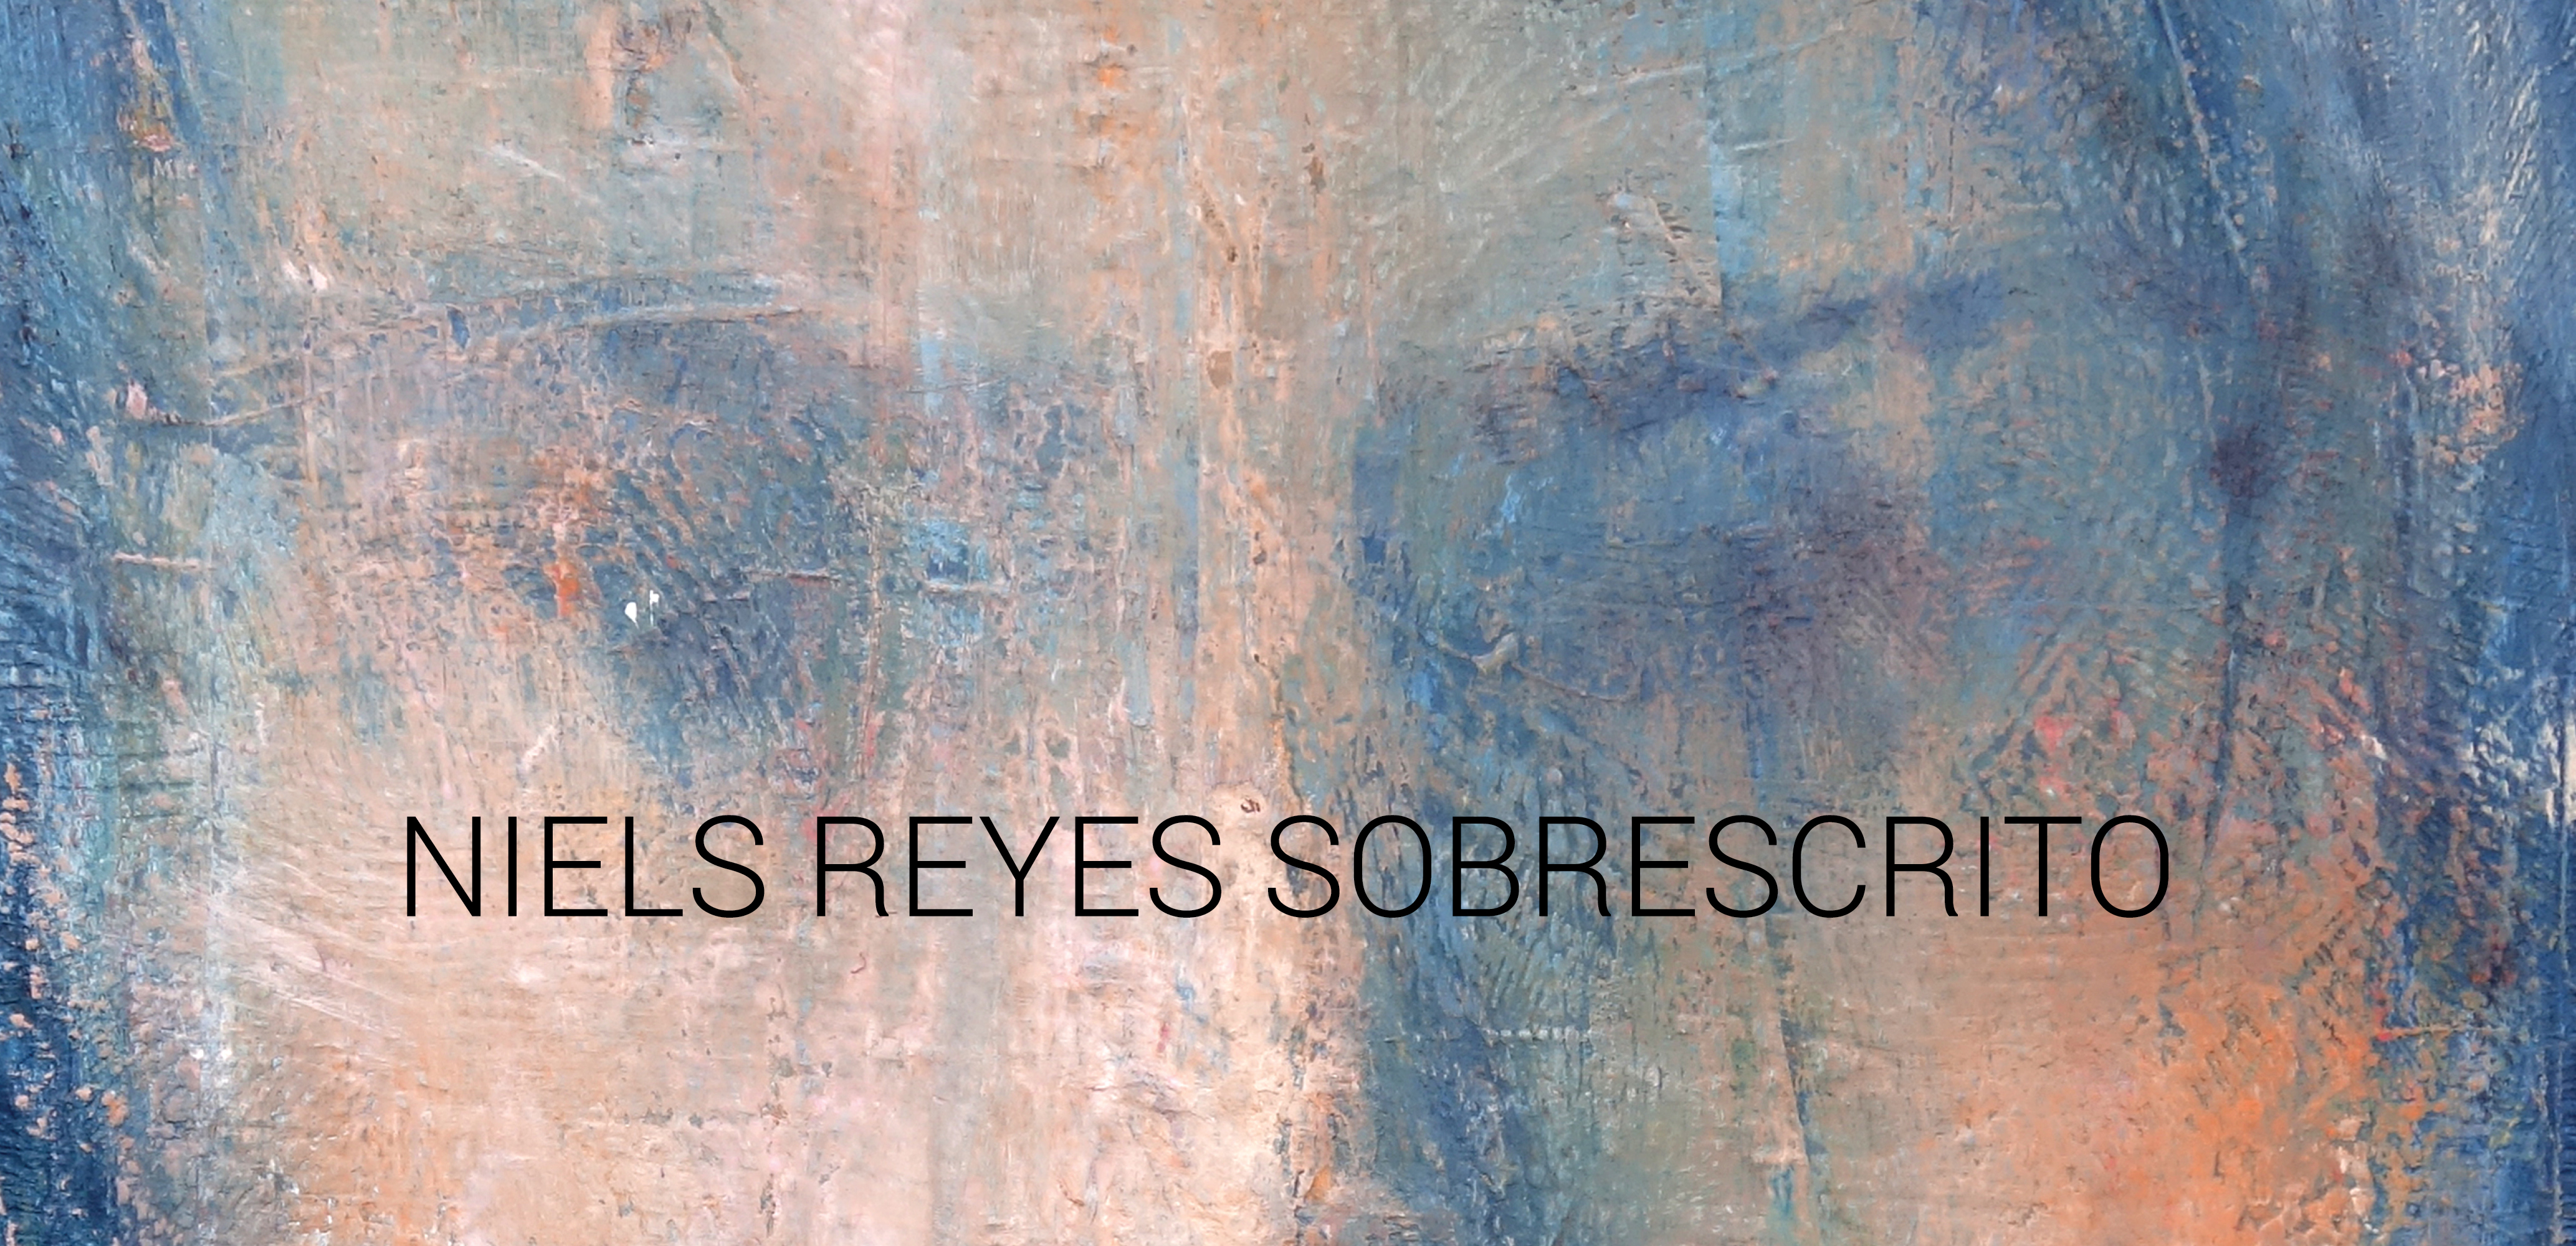 _NielsReyesSobrescrito_banner